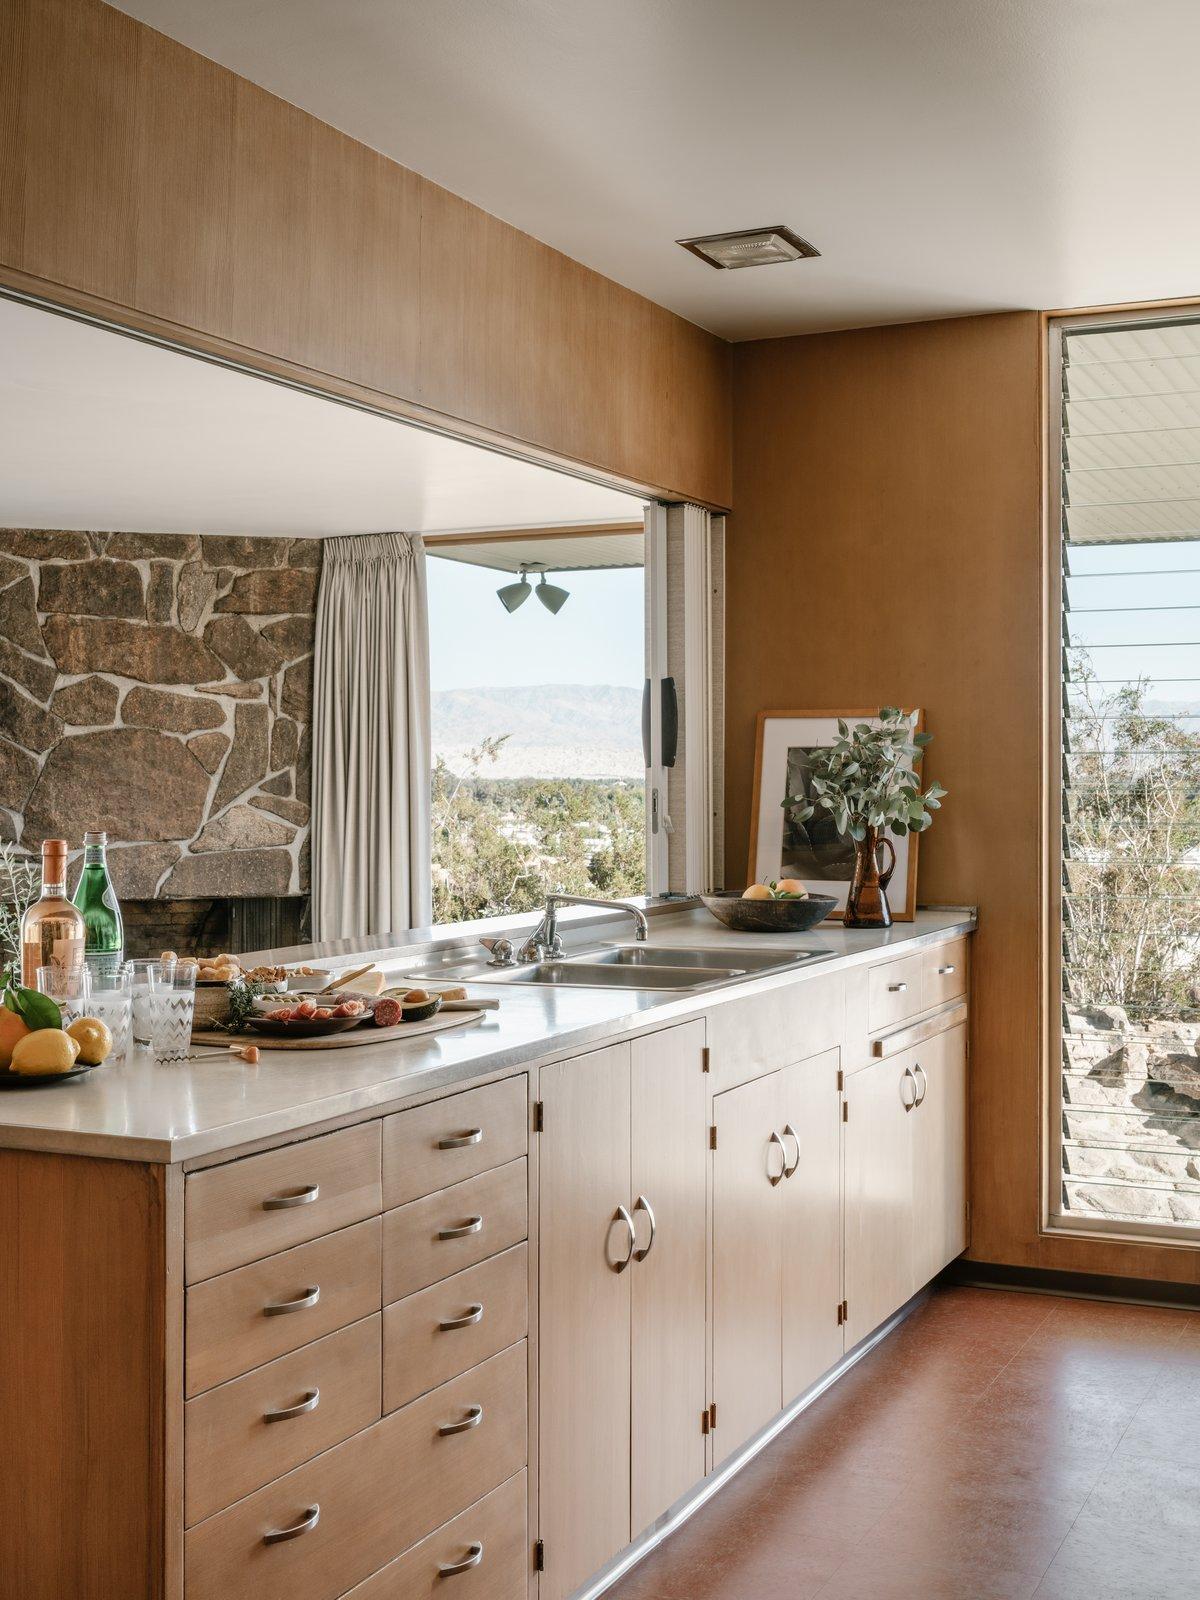 Cree House kitchen